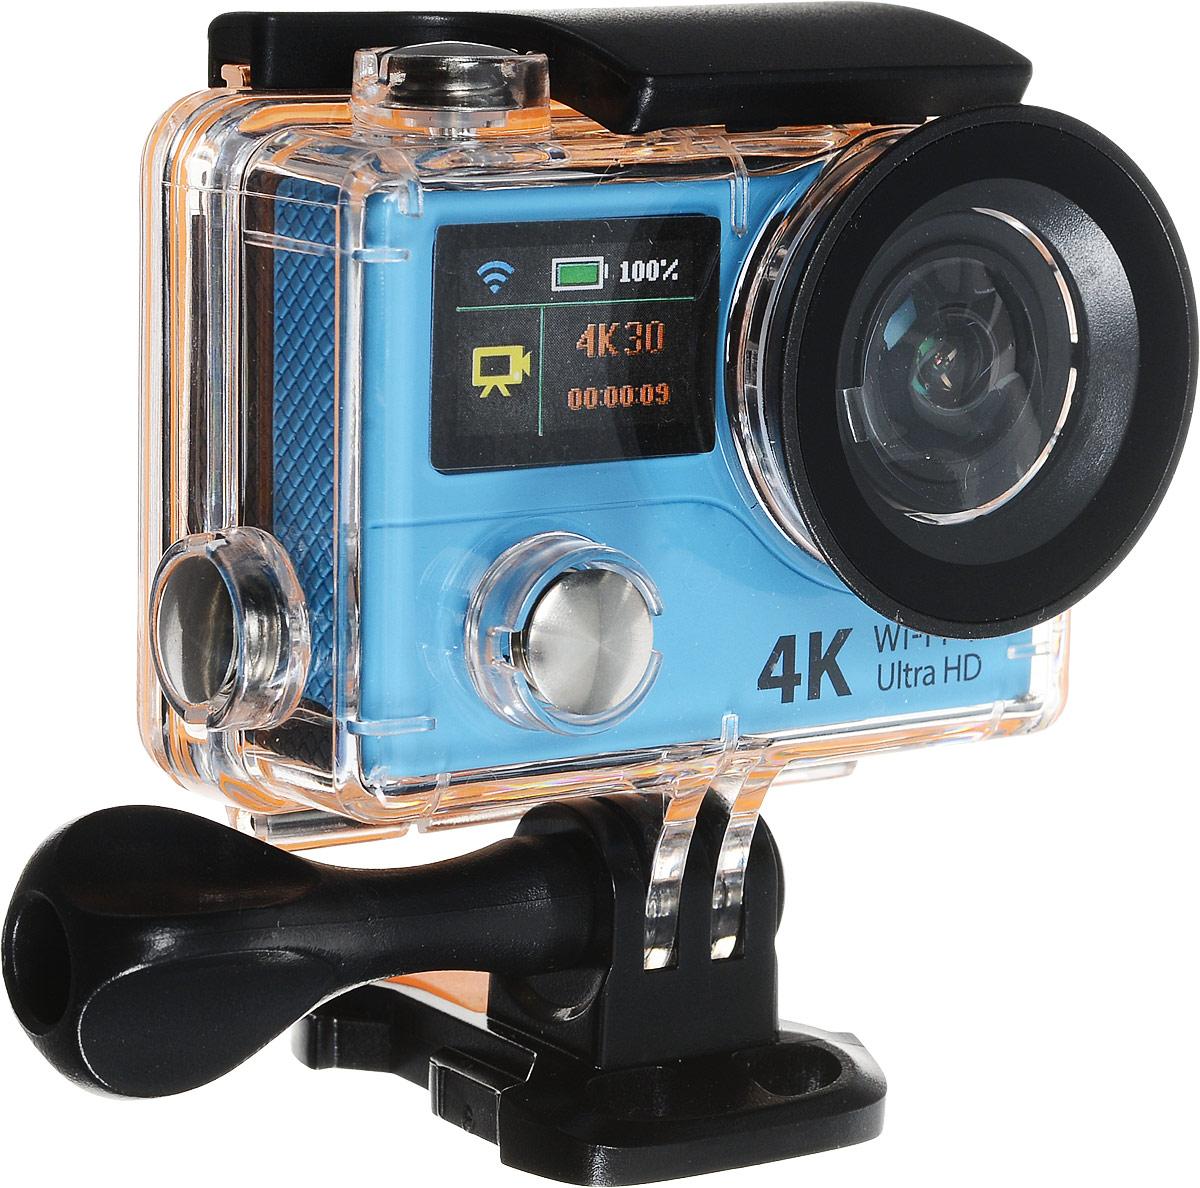 Eken H3R Ultra HD, Blue экшн-камера - Цифровые видеокамеры